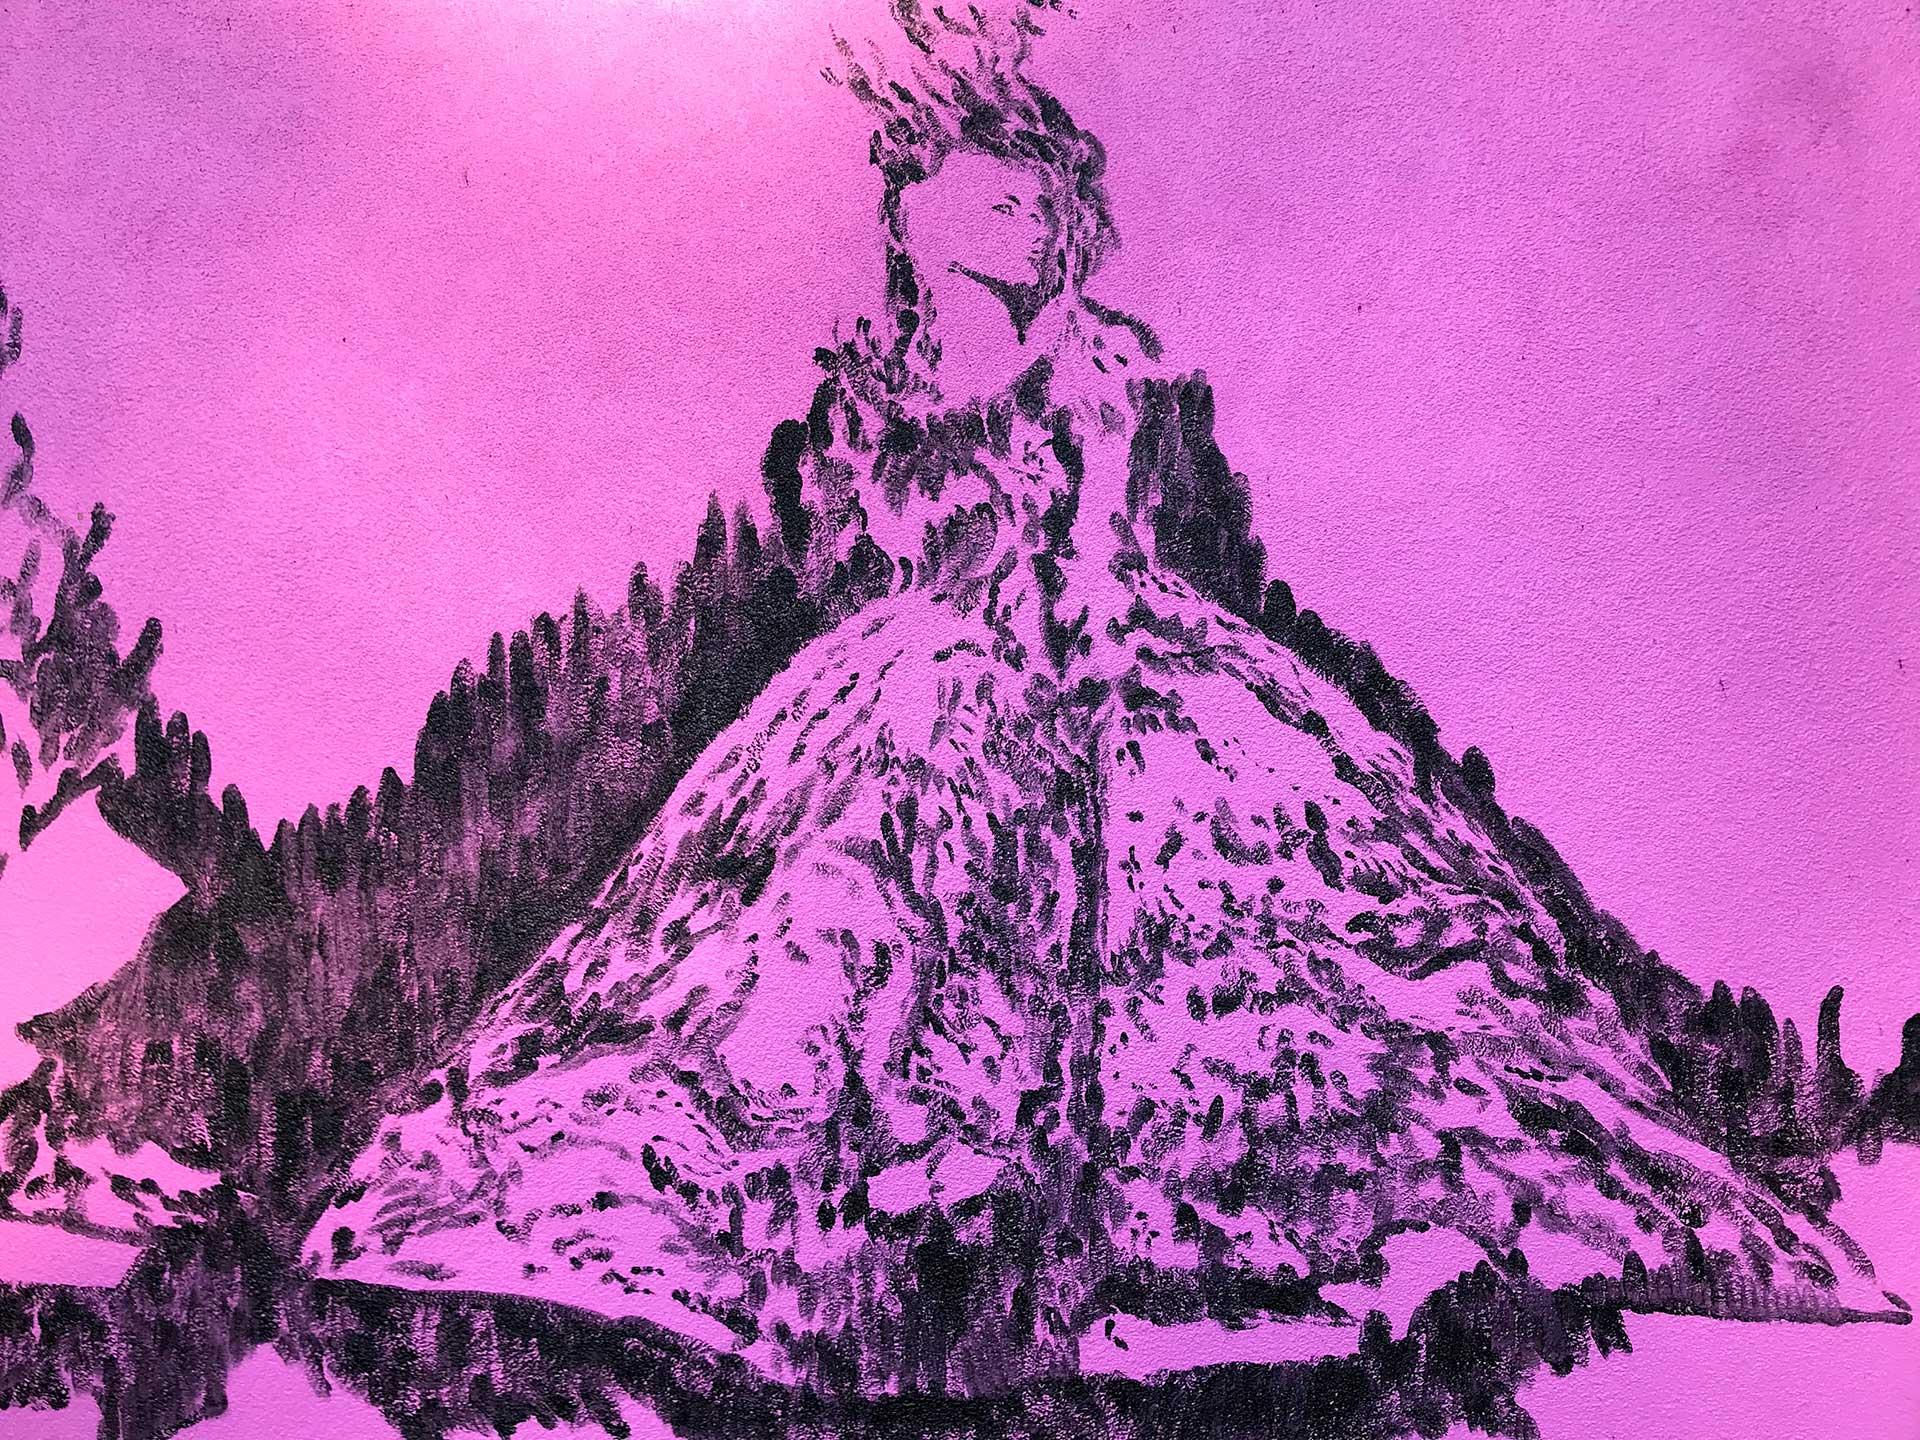 pink mural - queen mural - custom mural - mural - Dace Kidd - Mural Artist Tx